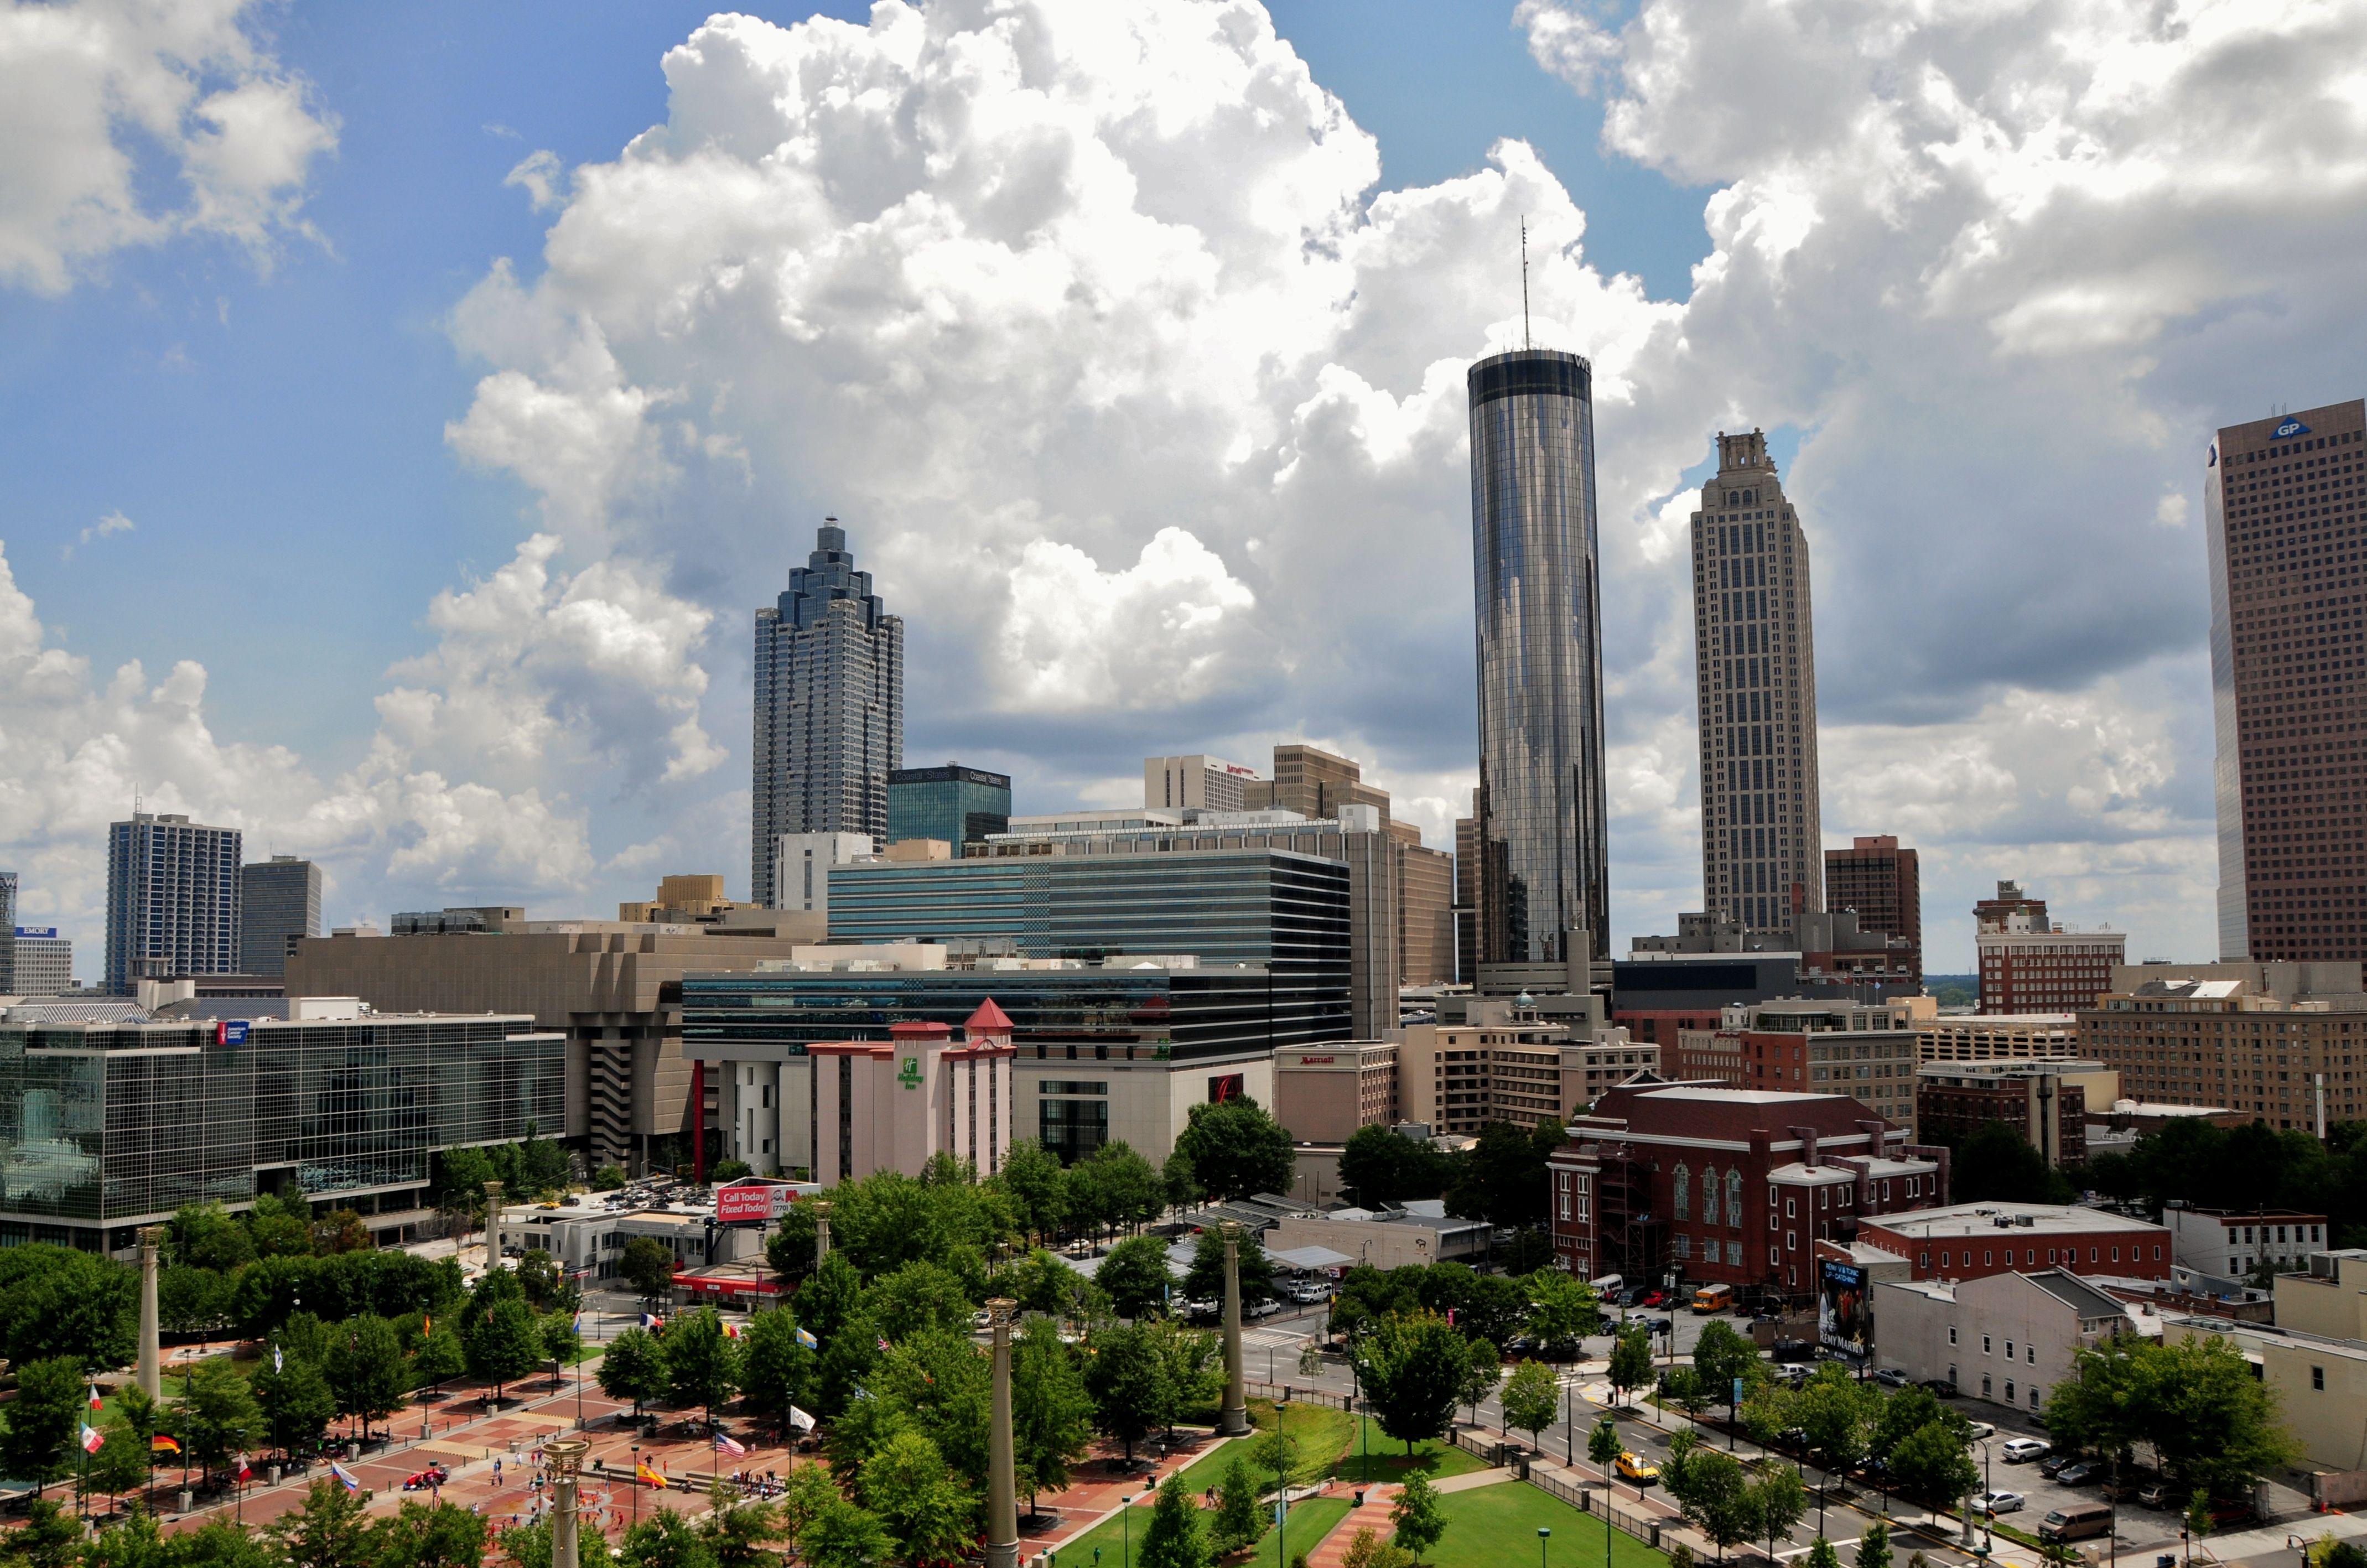 Атланта джорджия дома картинки